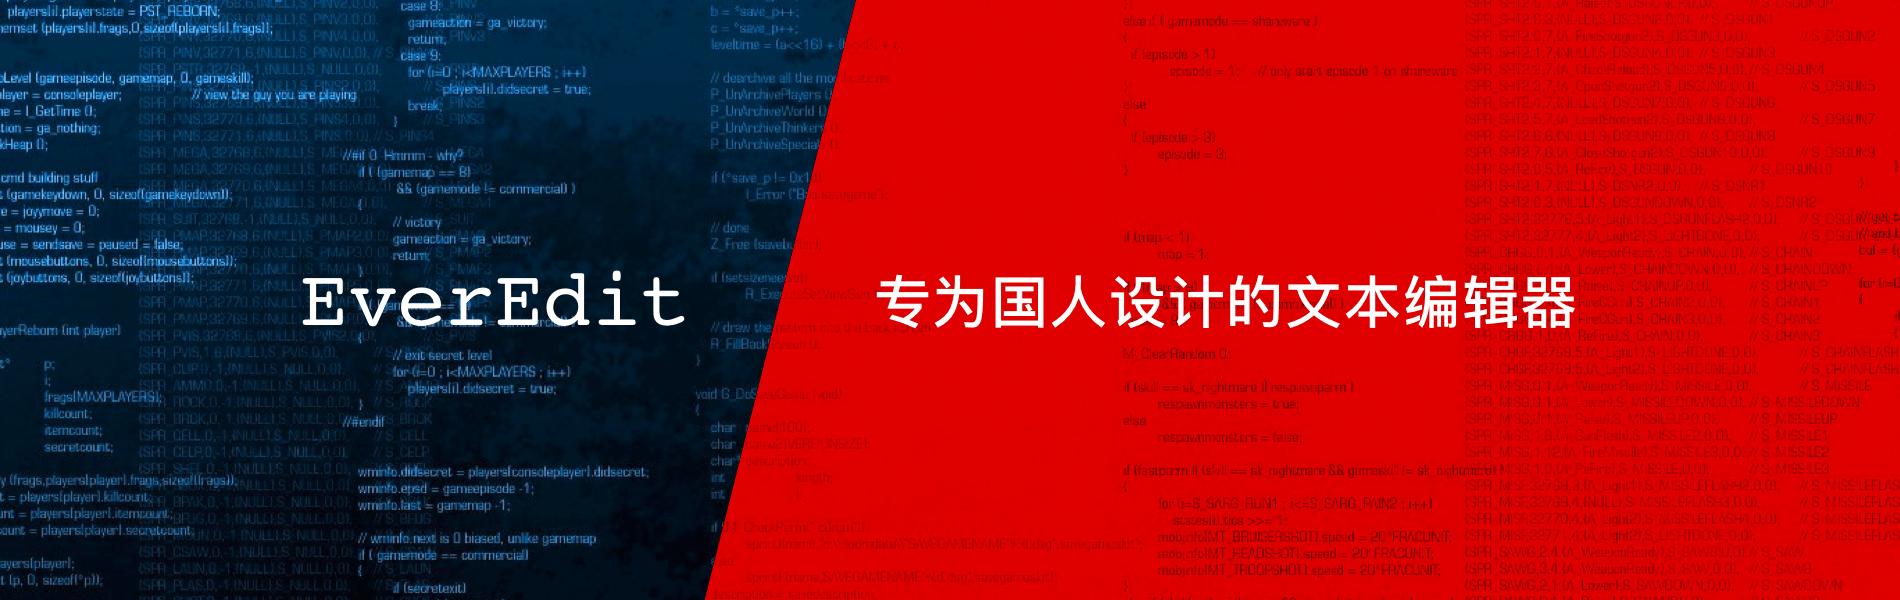 EverEdit:专为国人设计的文本编辑器